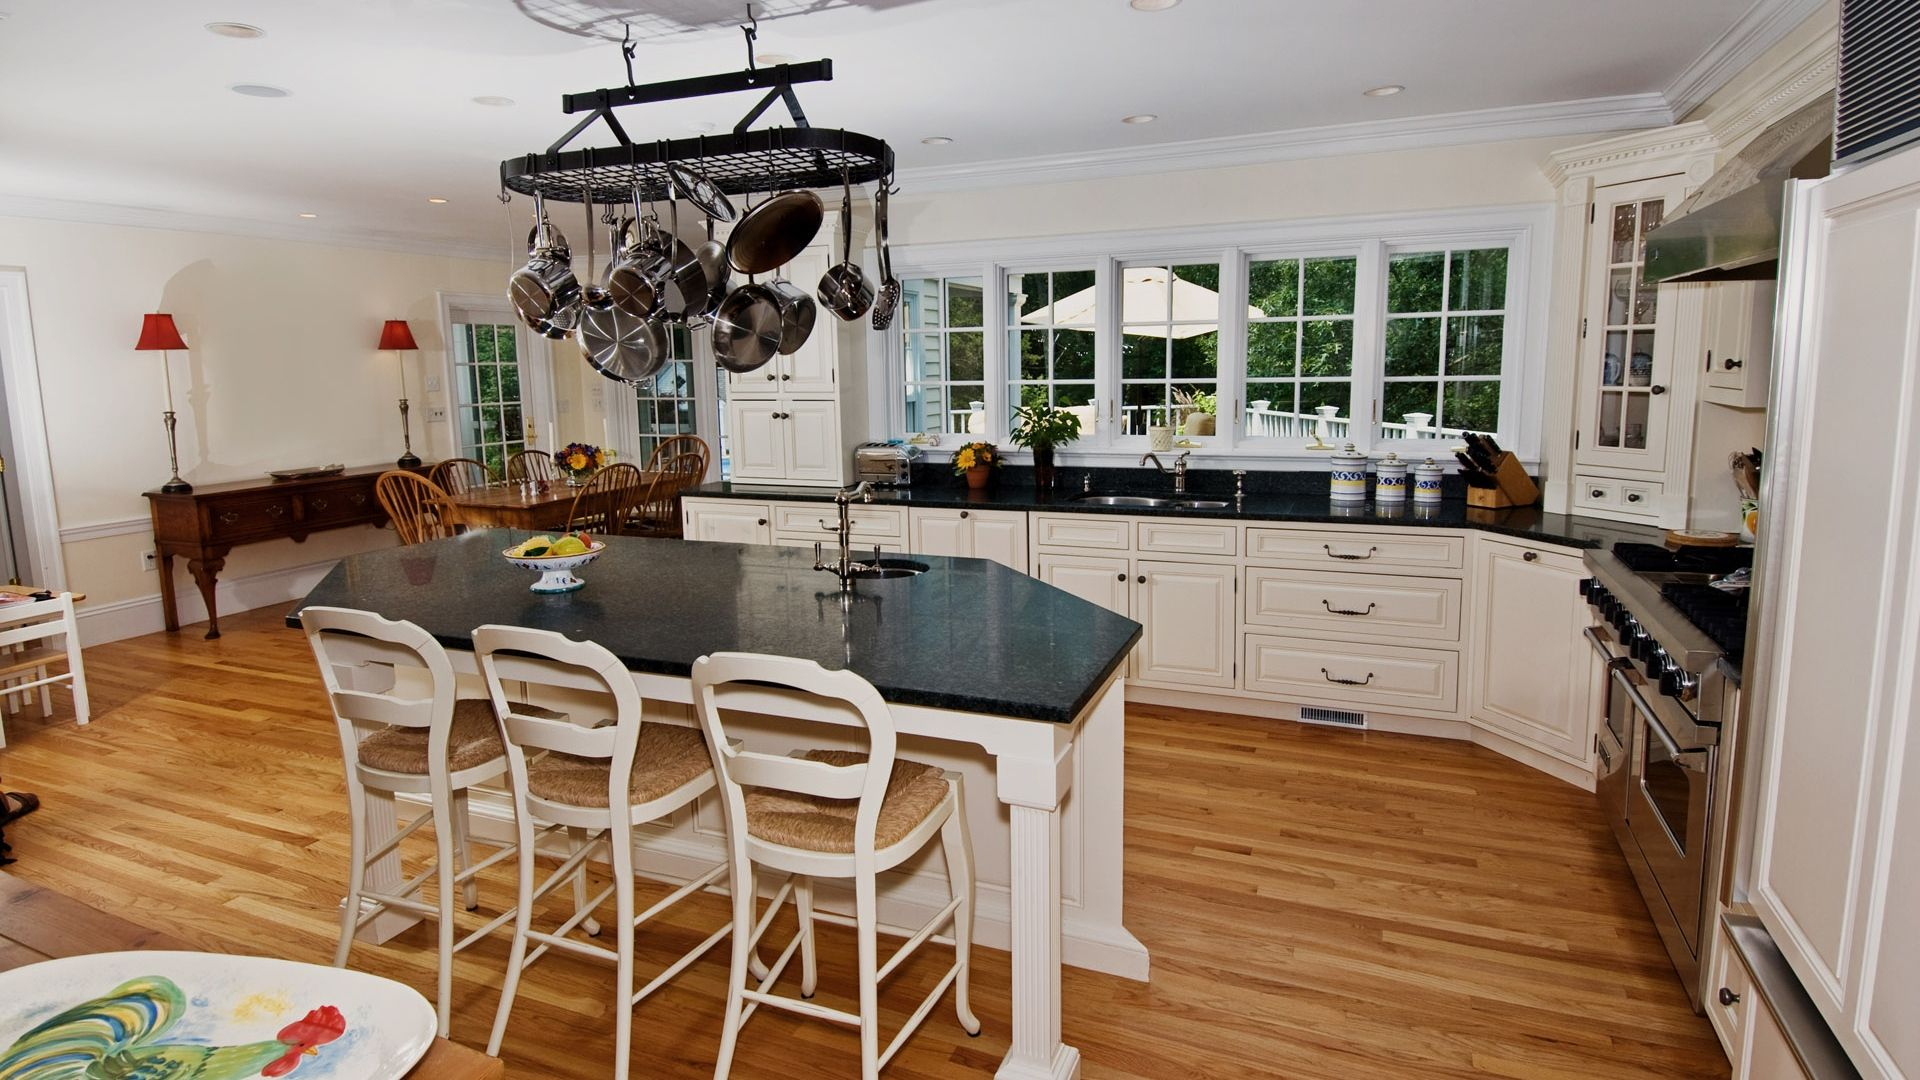 Download Wallpaper 1920x1080 Dining Room Kitchen Table Furniture Interior Full Hd Country Kitchen Interiors Kitchen Flooring Options Modern Kitchen Design